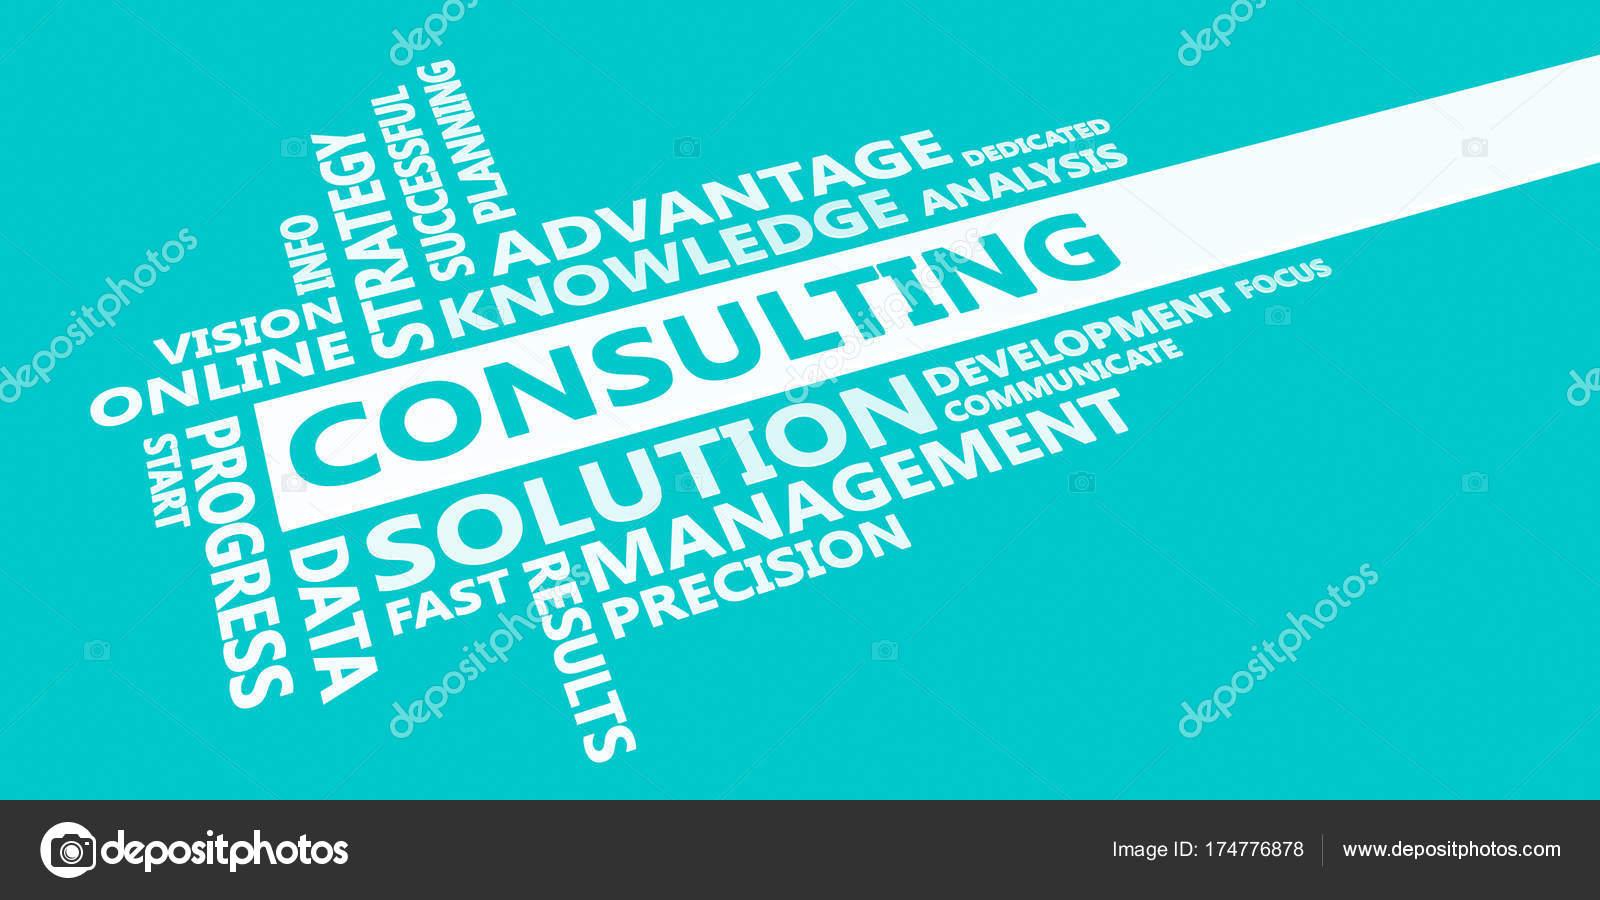 Consulting Presentation Background — Stock Photo © kentoh